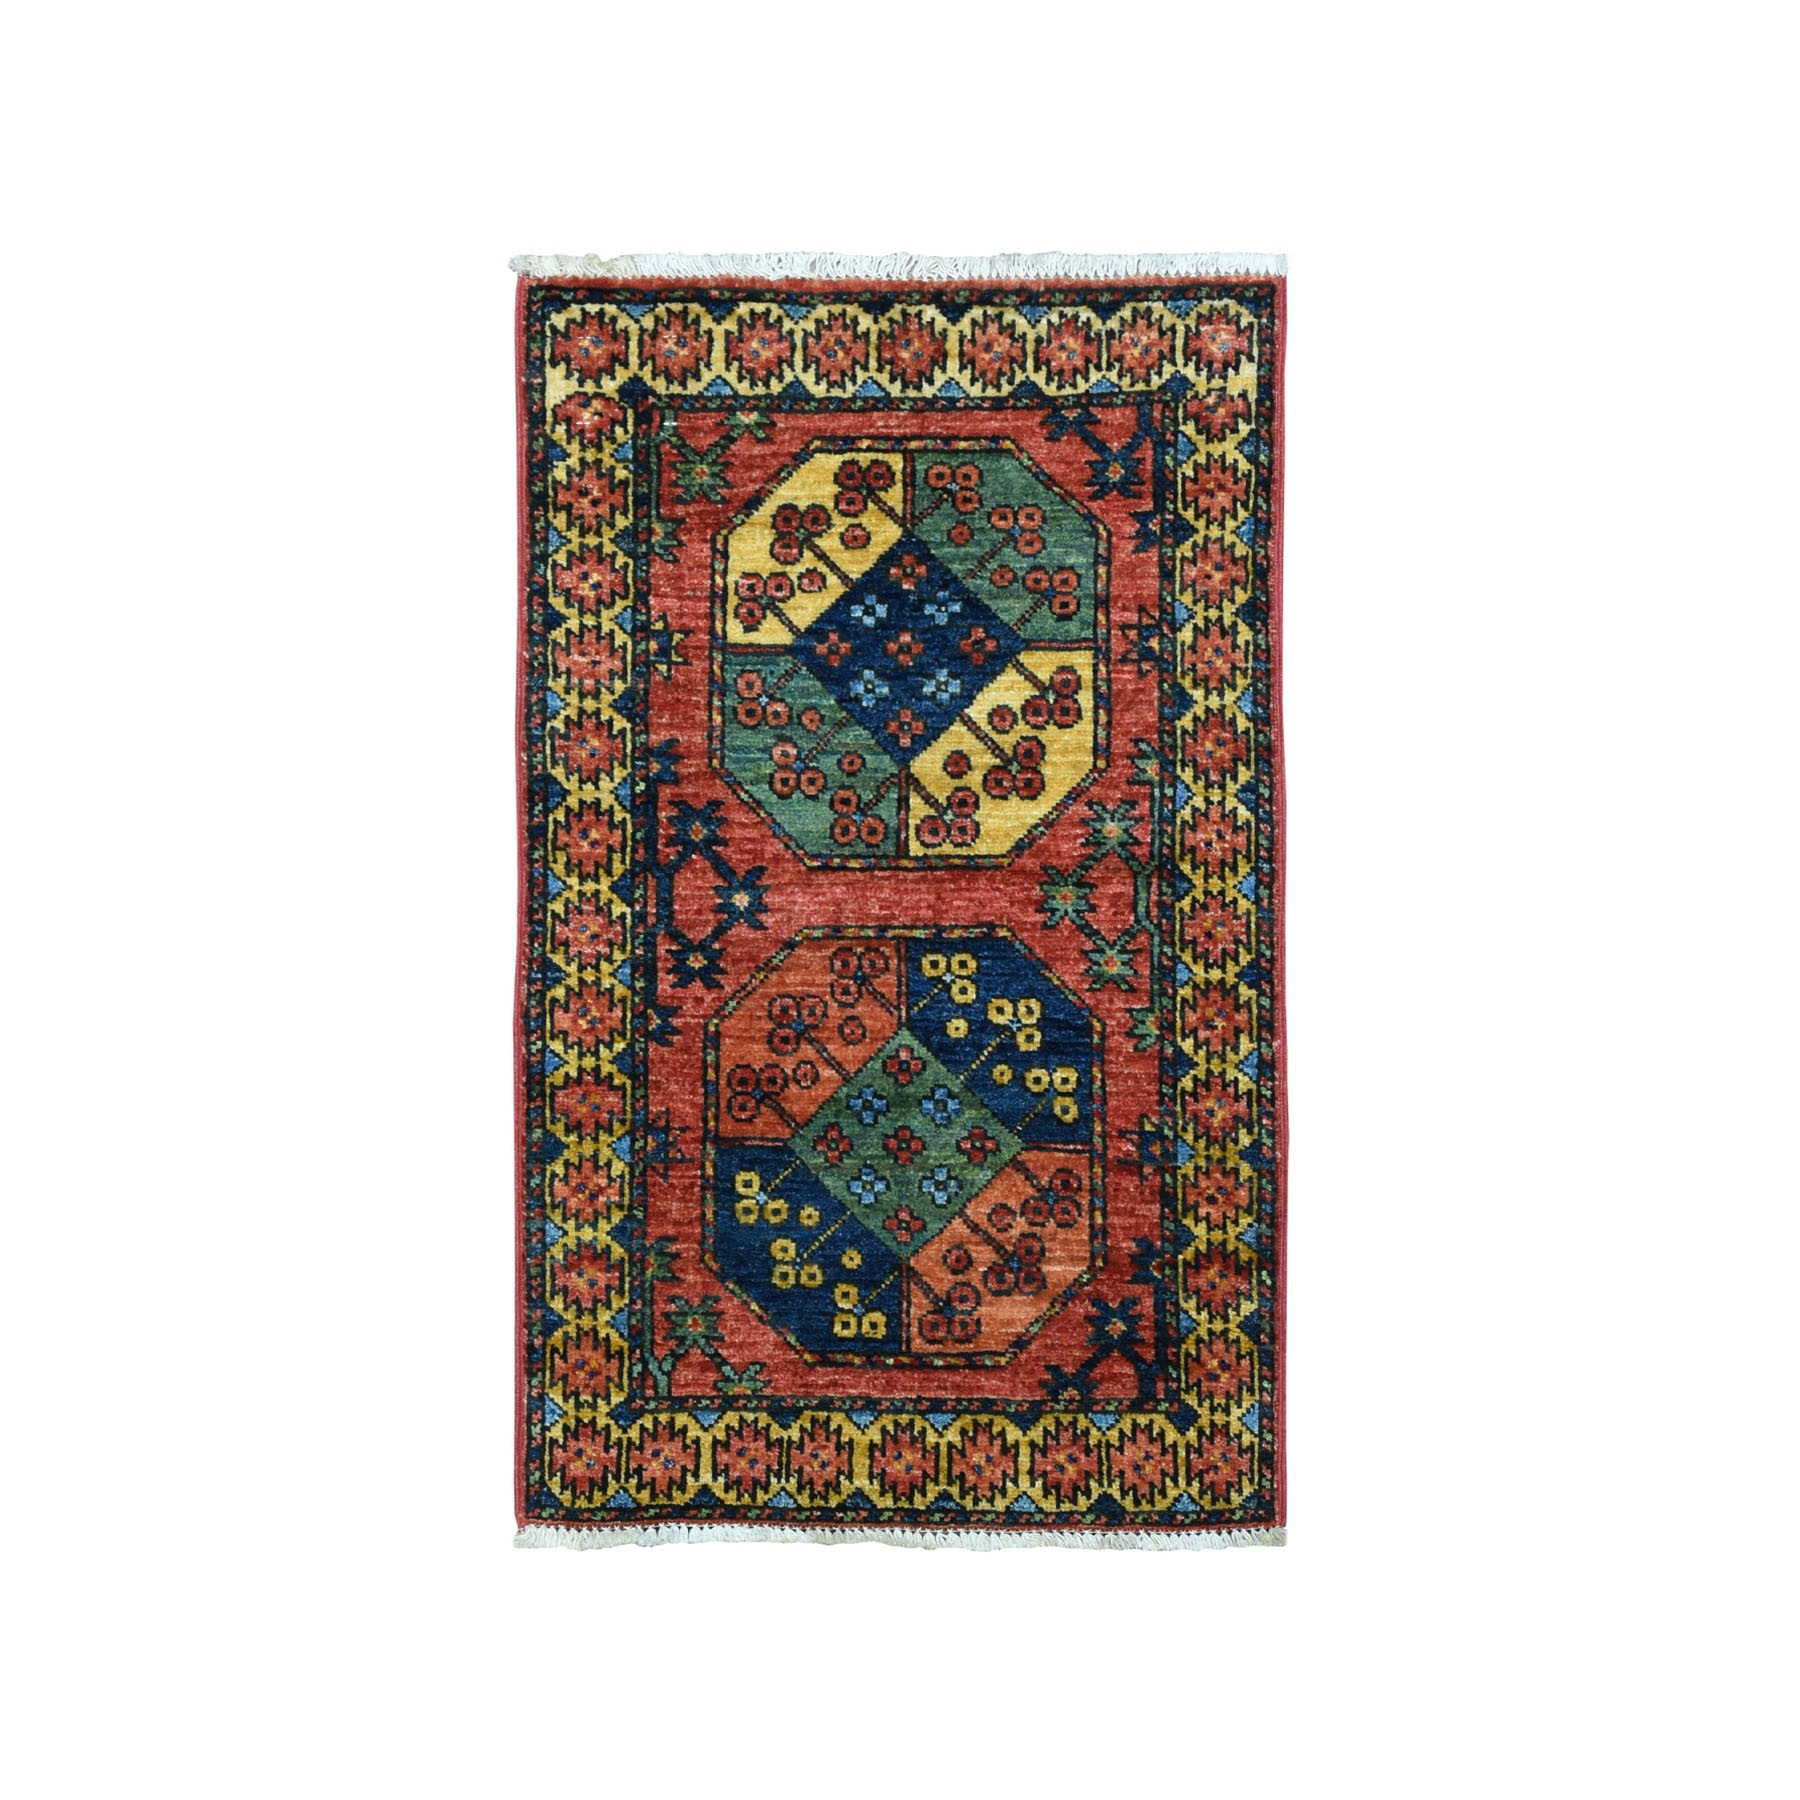 "2'1""X3' Afghan Ersari Elephant Feet Design Pure Wool Hand-Knotted Rug moaeacc6"